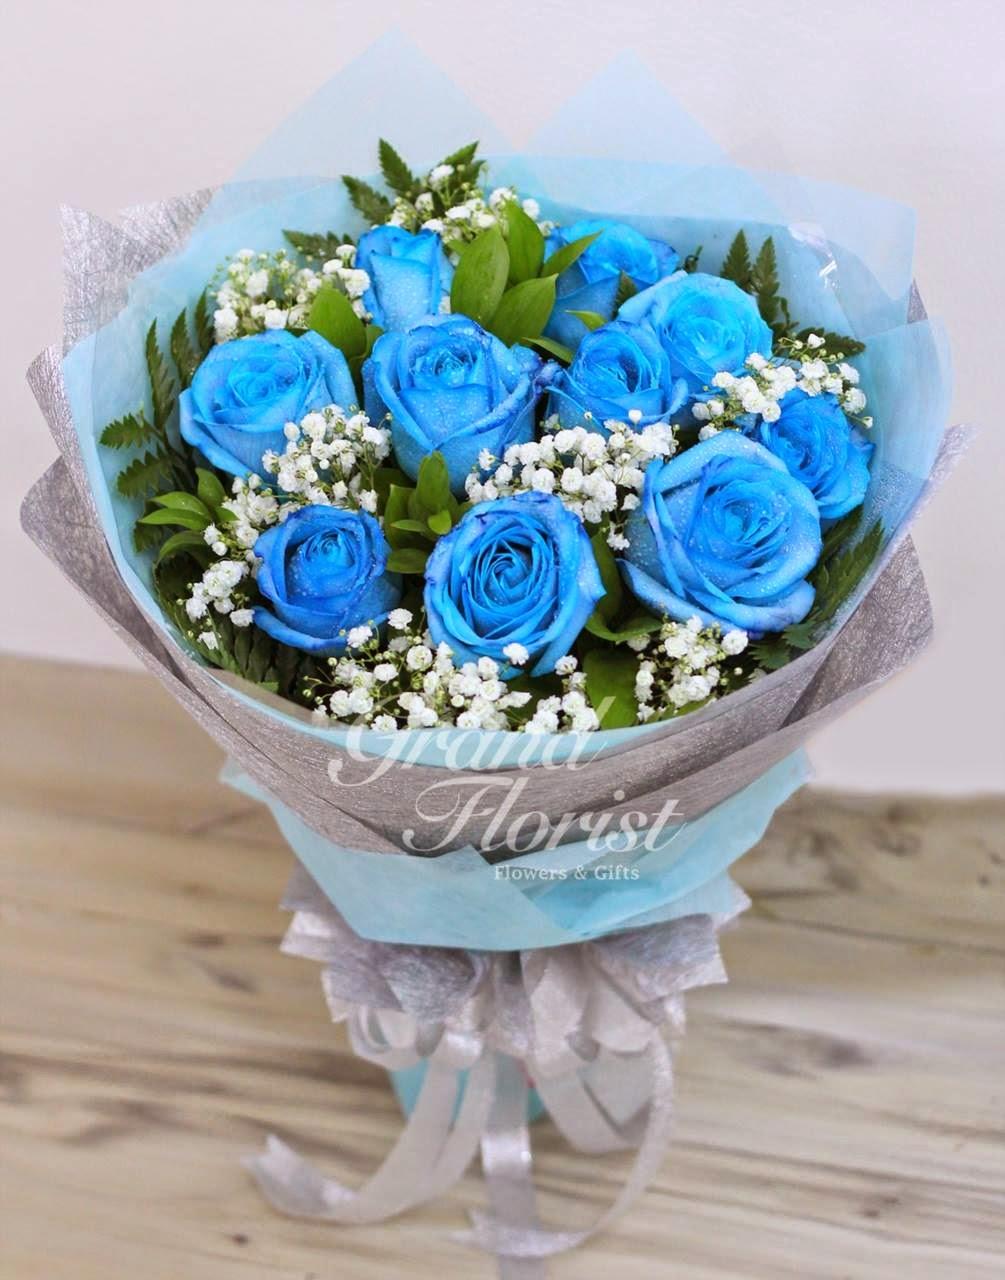 Hand Bouquet Bunga untuk Kado Ulang Tahun Romantis